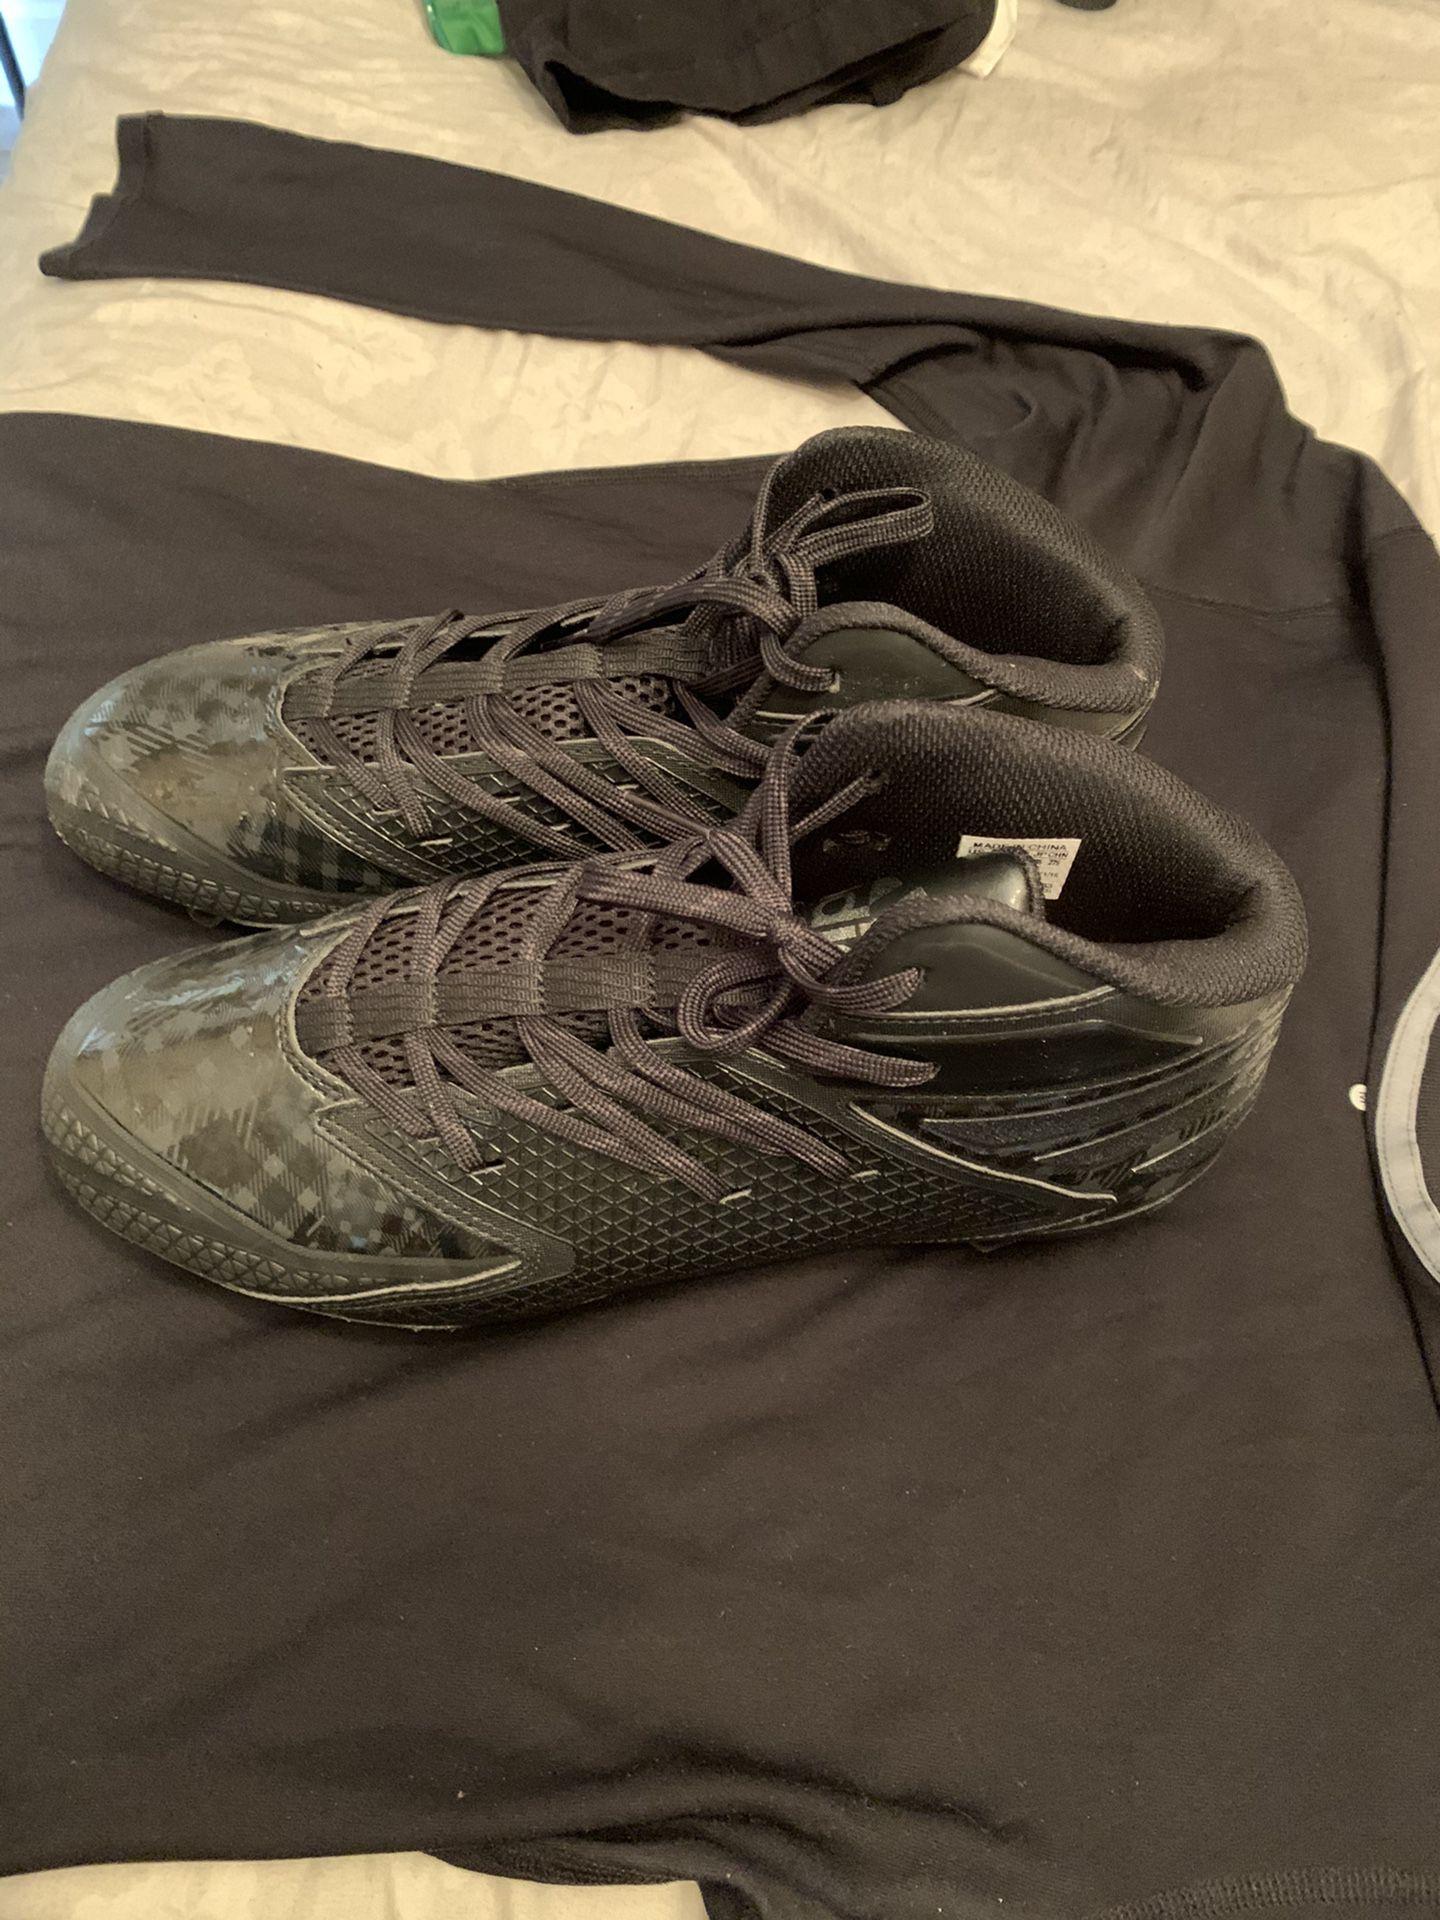 Adidas football or baseball cleats